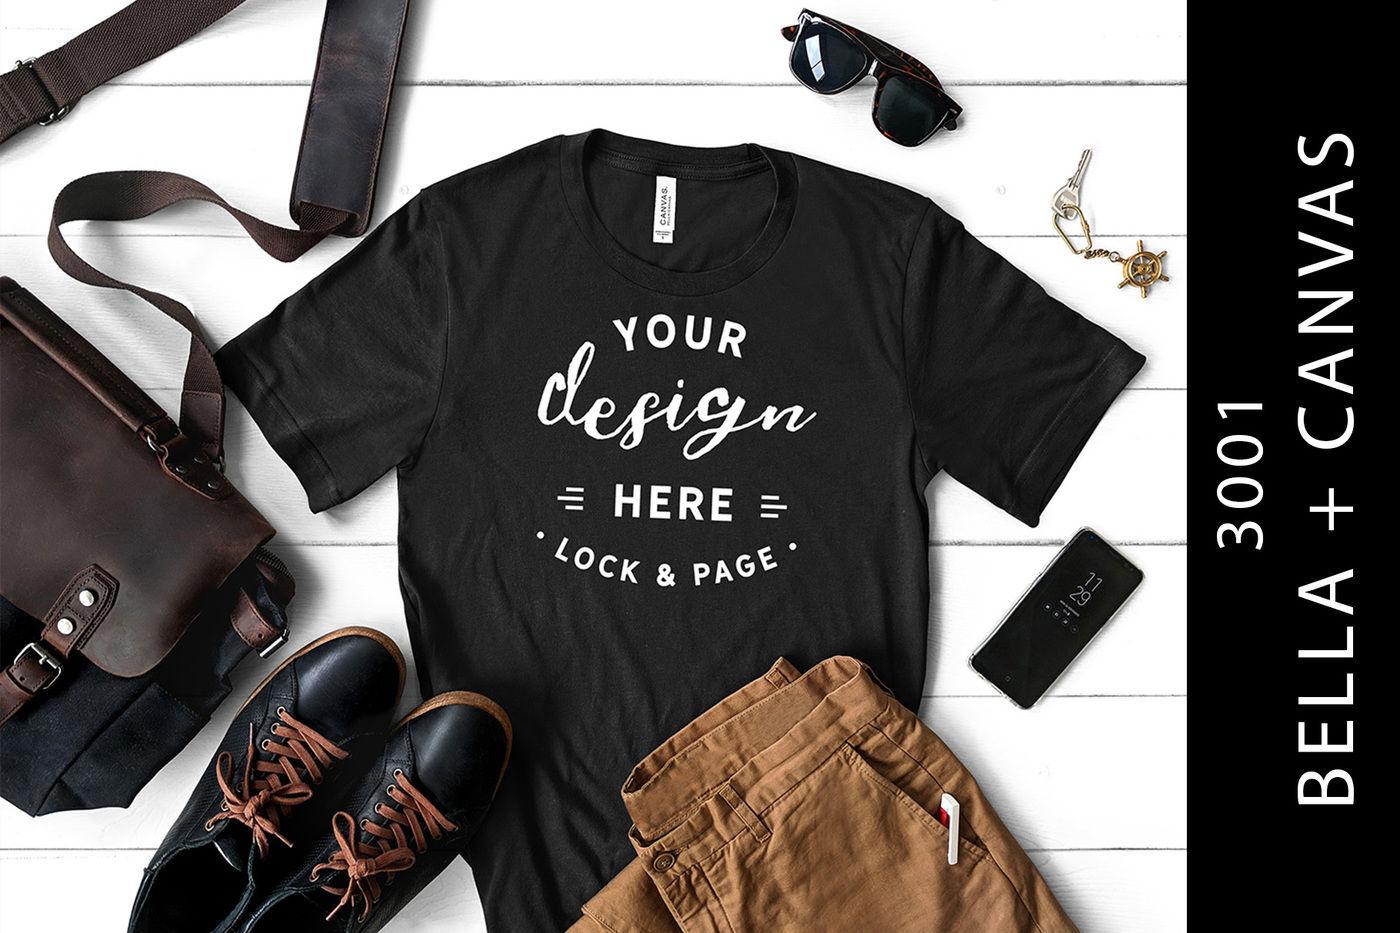 Tshirt Mockup Black Bella Canvas 3001 Mockup Flat Lay Mock up Black Unisex T-shirt Mock Up Model Mockup T-Shirt Flat Lay